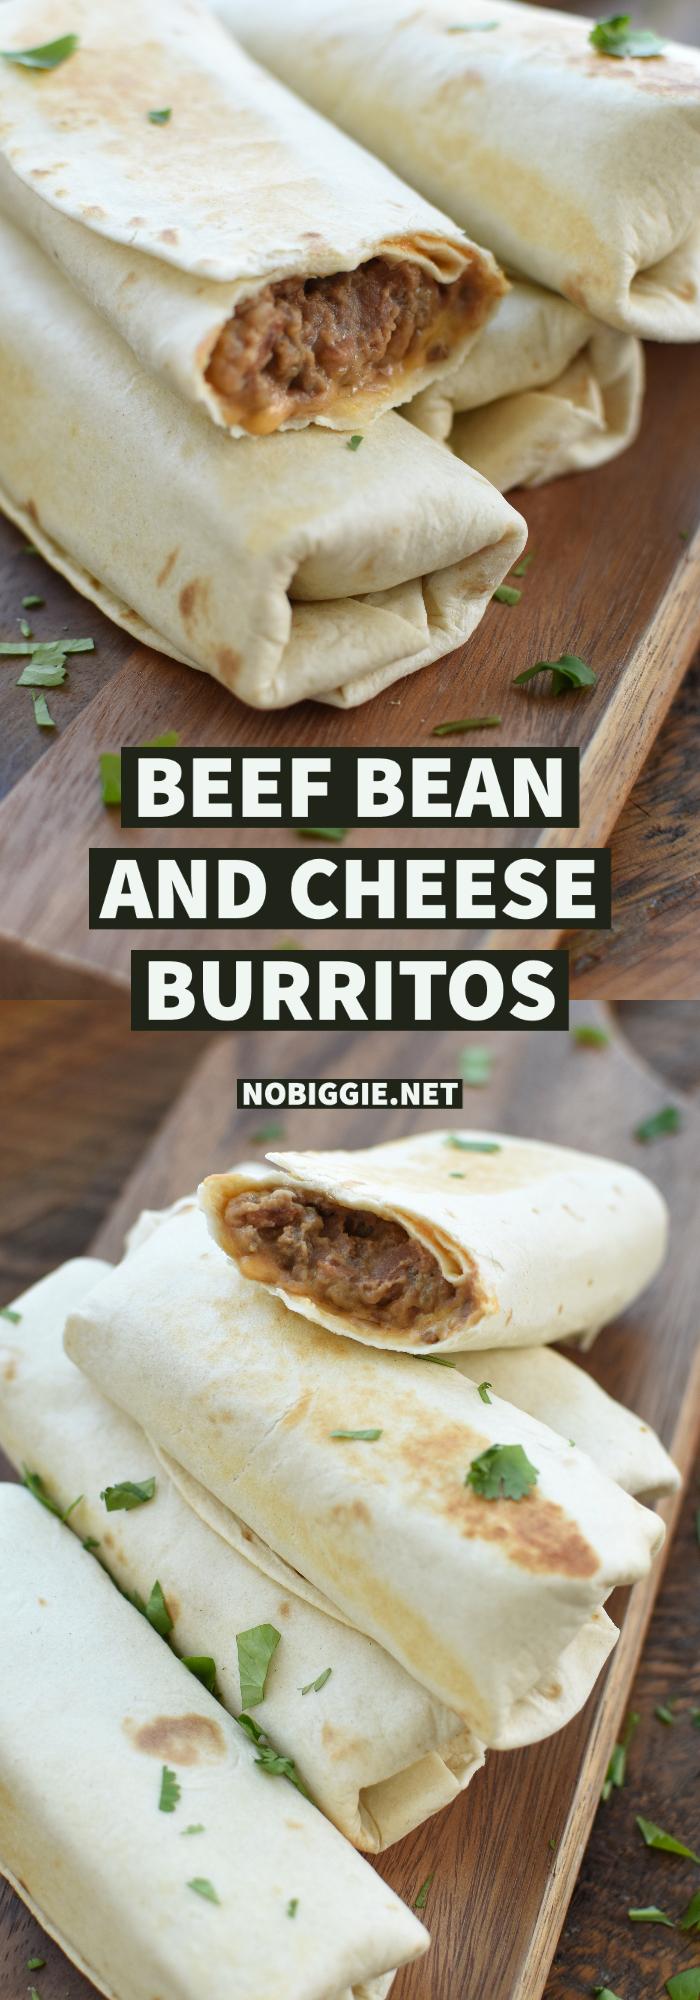 beef bean and cheese burritos | NoBiggie.net